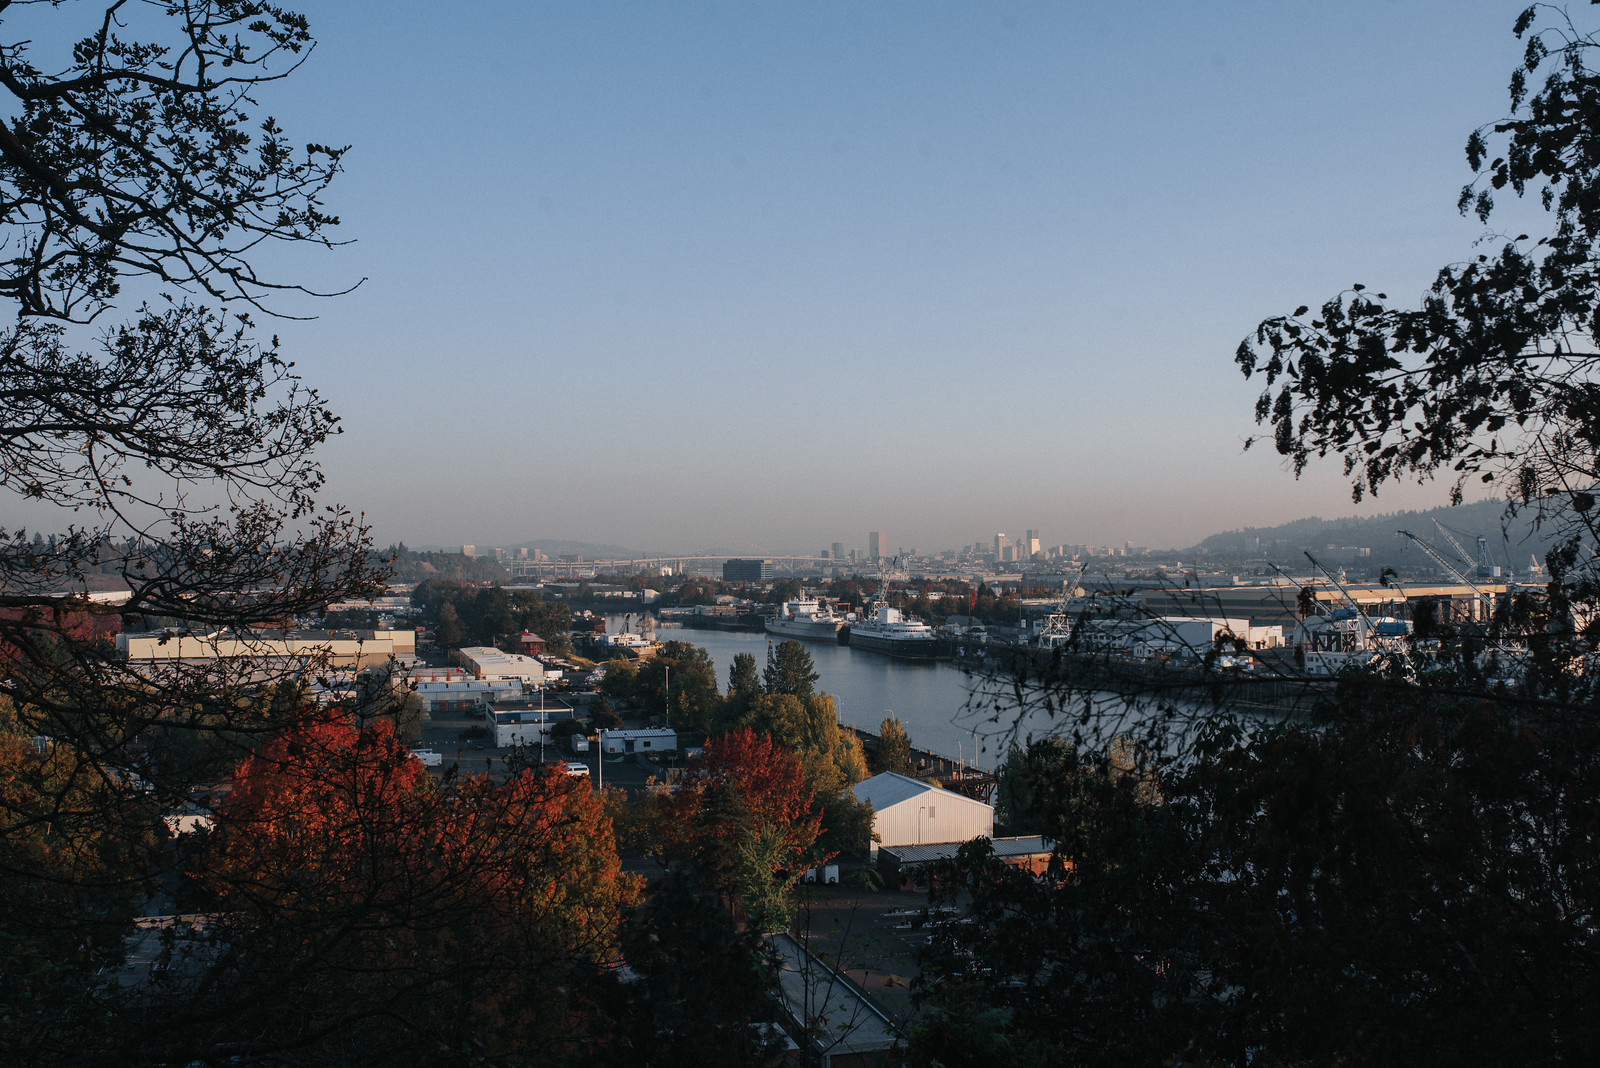 10.21.2018_Fall Pics-2-X3.jpg